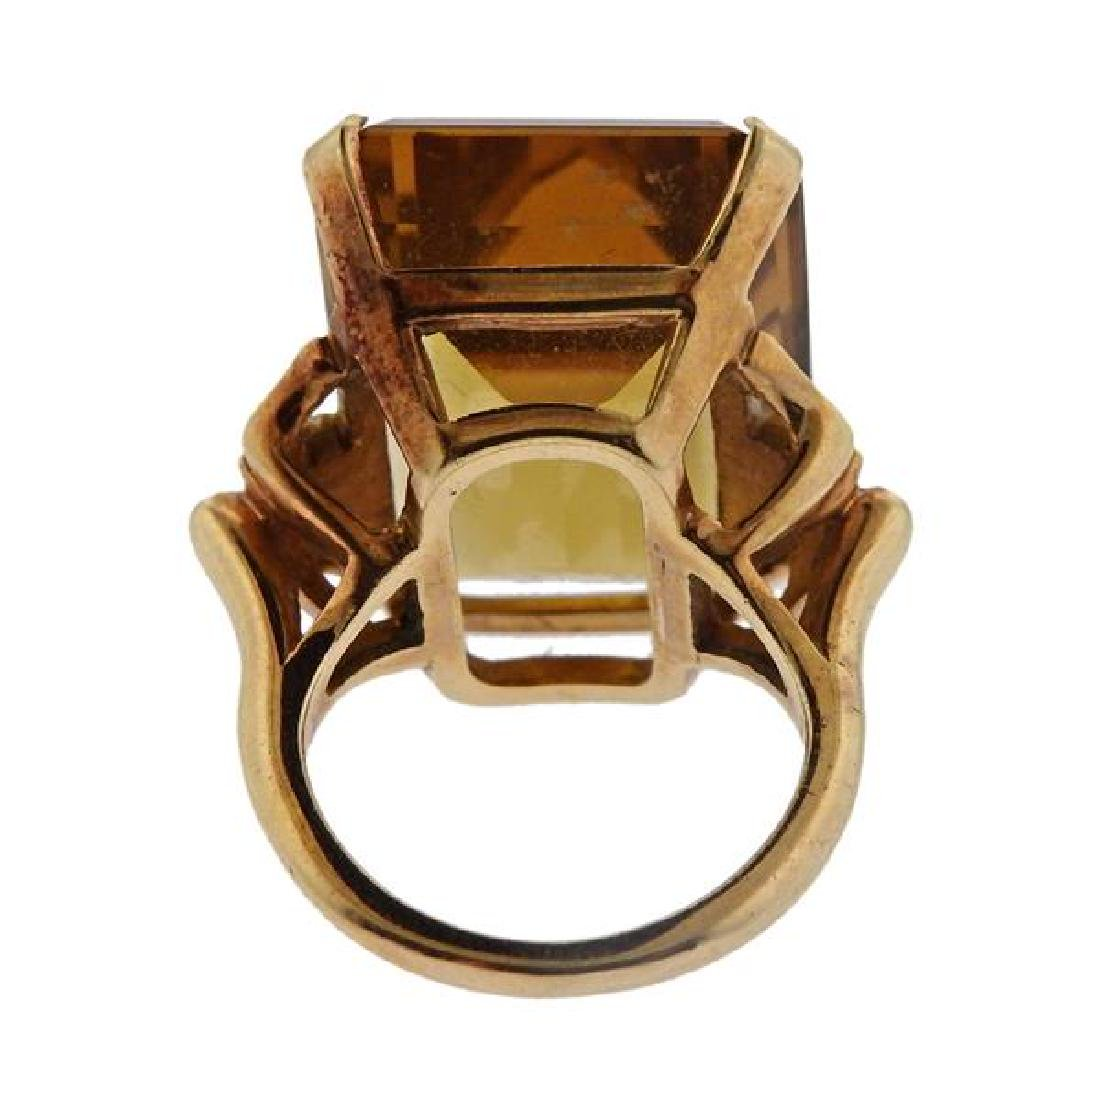 14K Gold Orange Stone Cocktail Ring - 3